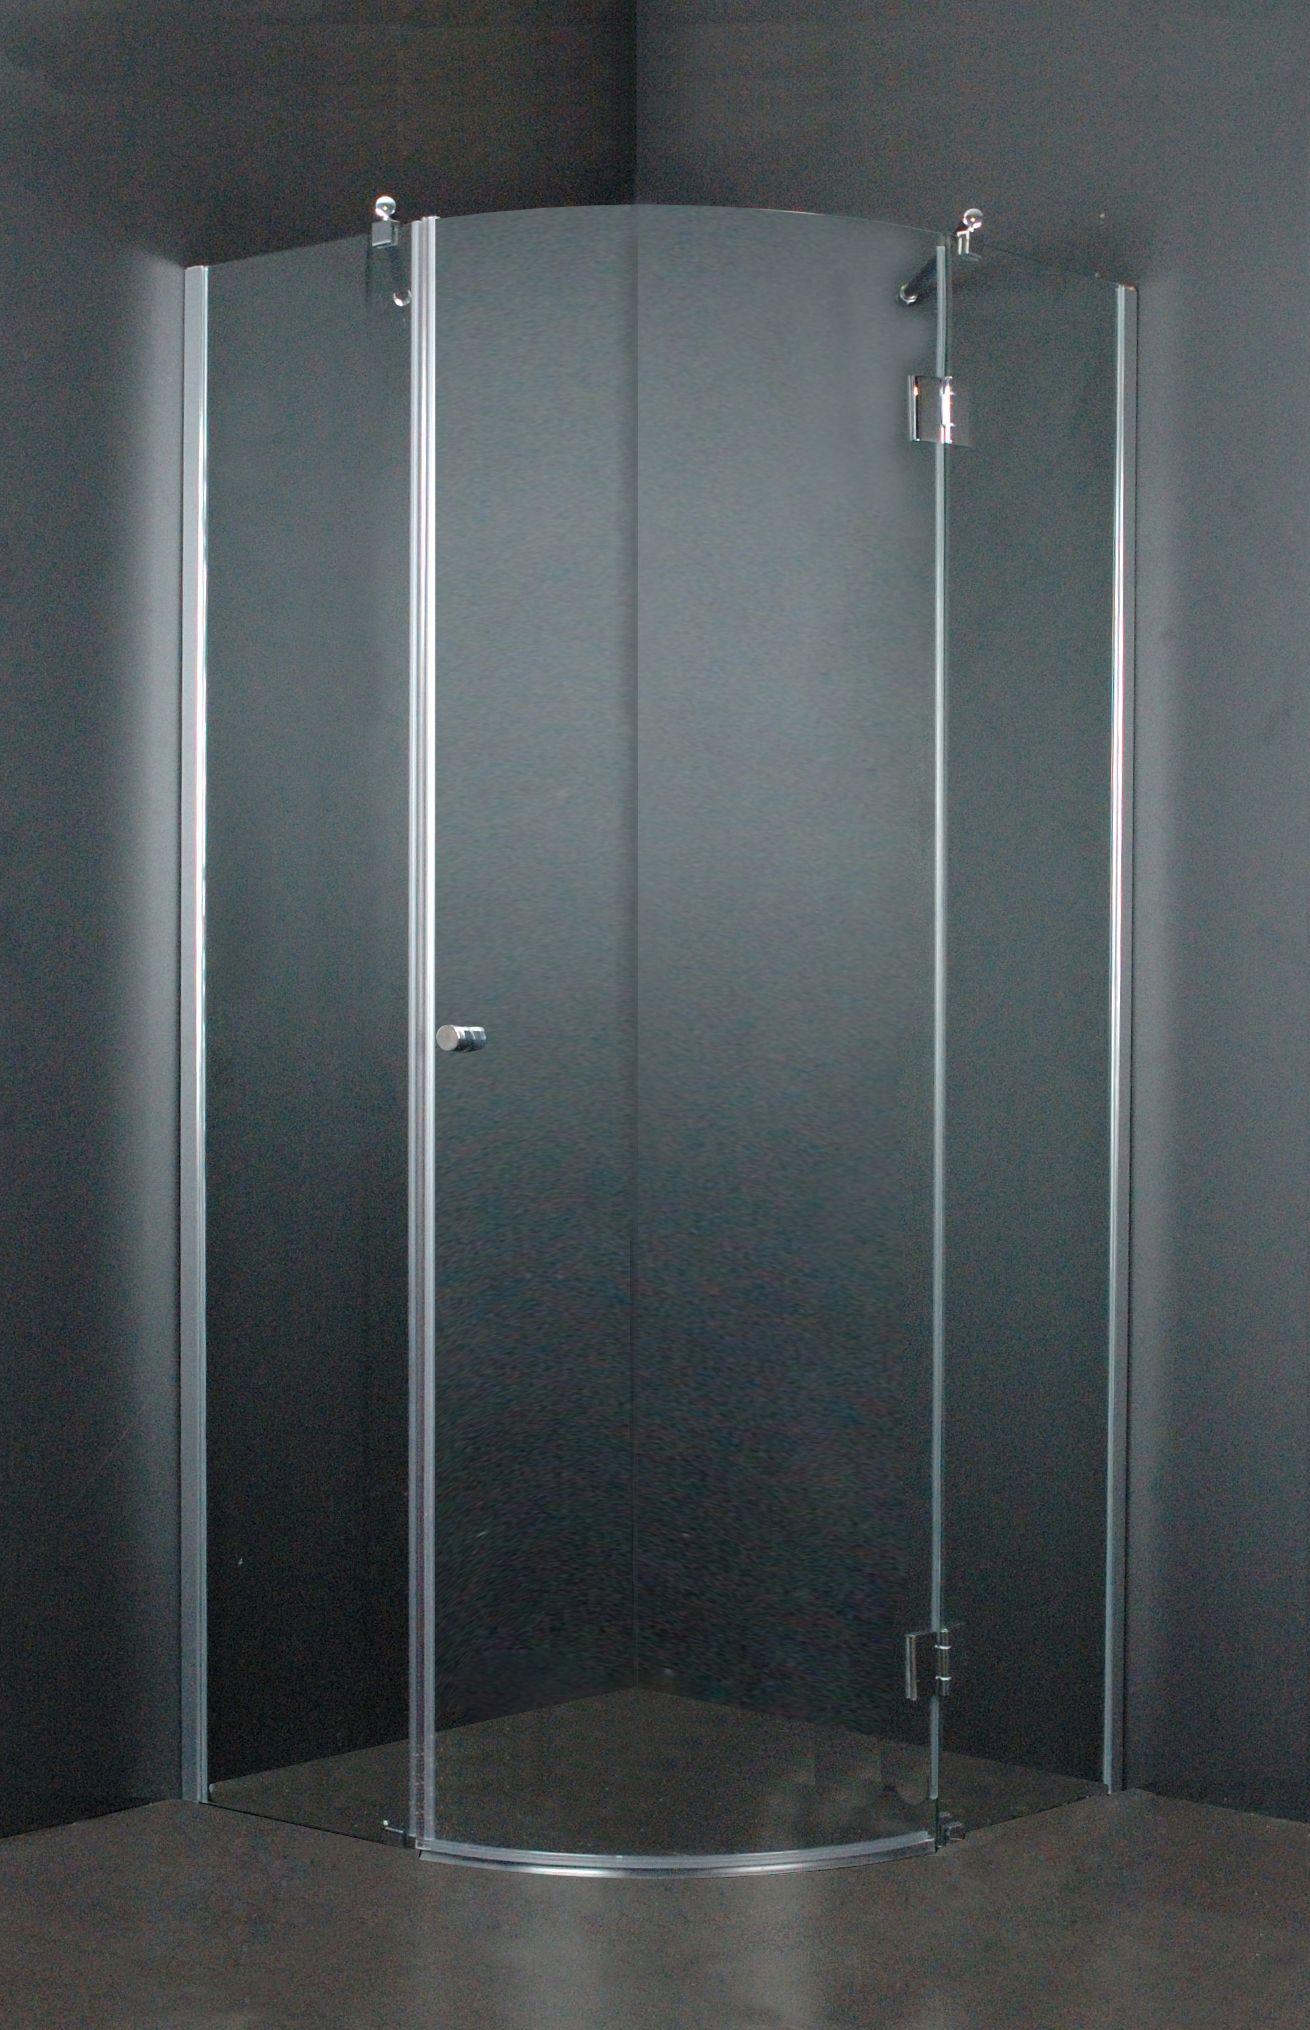 kwart ronde douchecabine met à à n deur gemaakt van glas